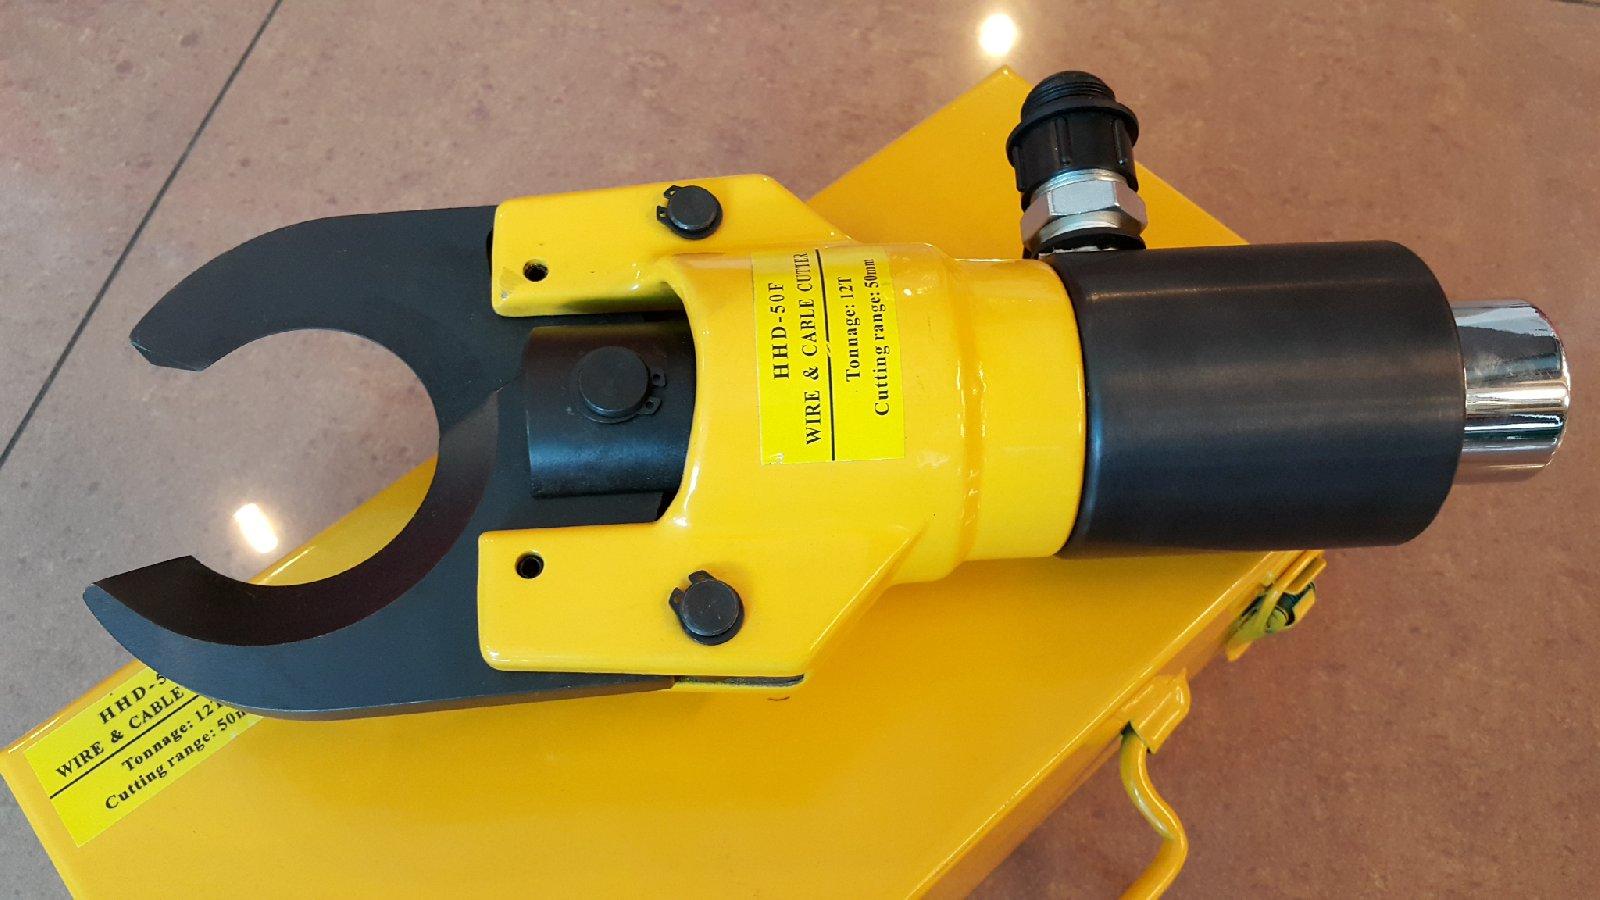 Kìm cắt sắt có tích hợp máy bơm thủy lực TLP